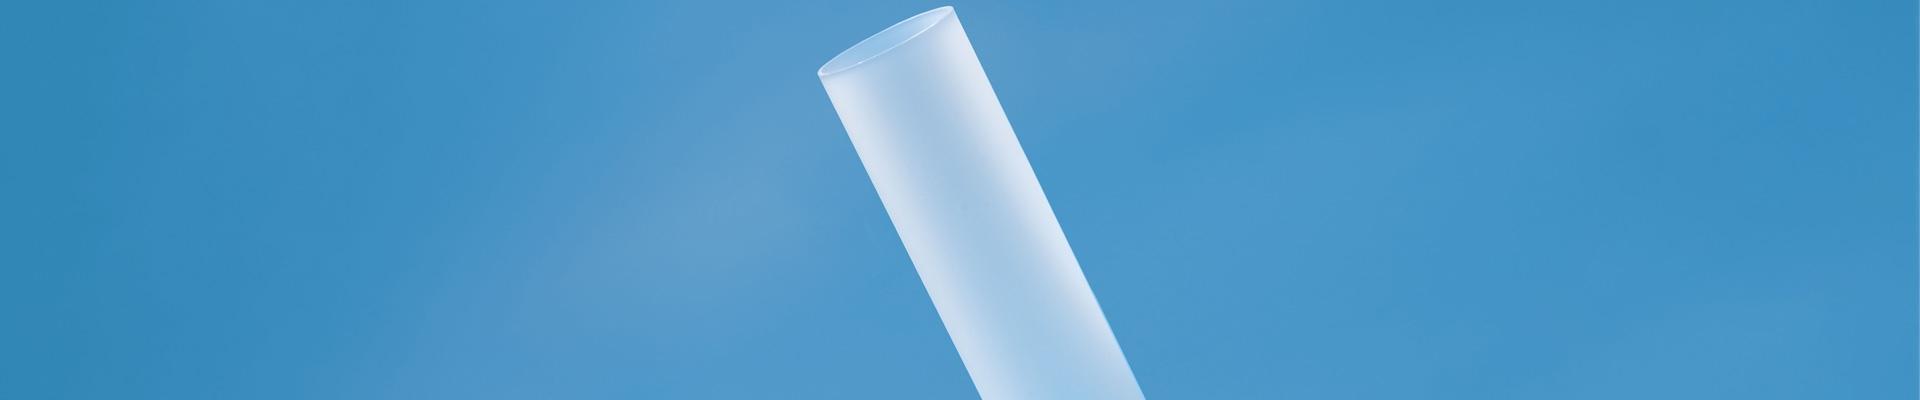 Polycarbonat Rohr